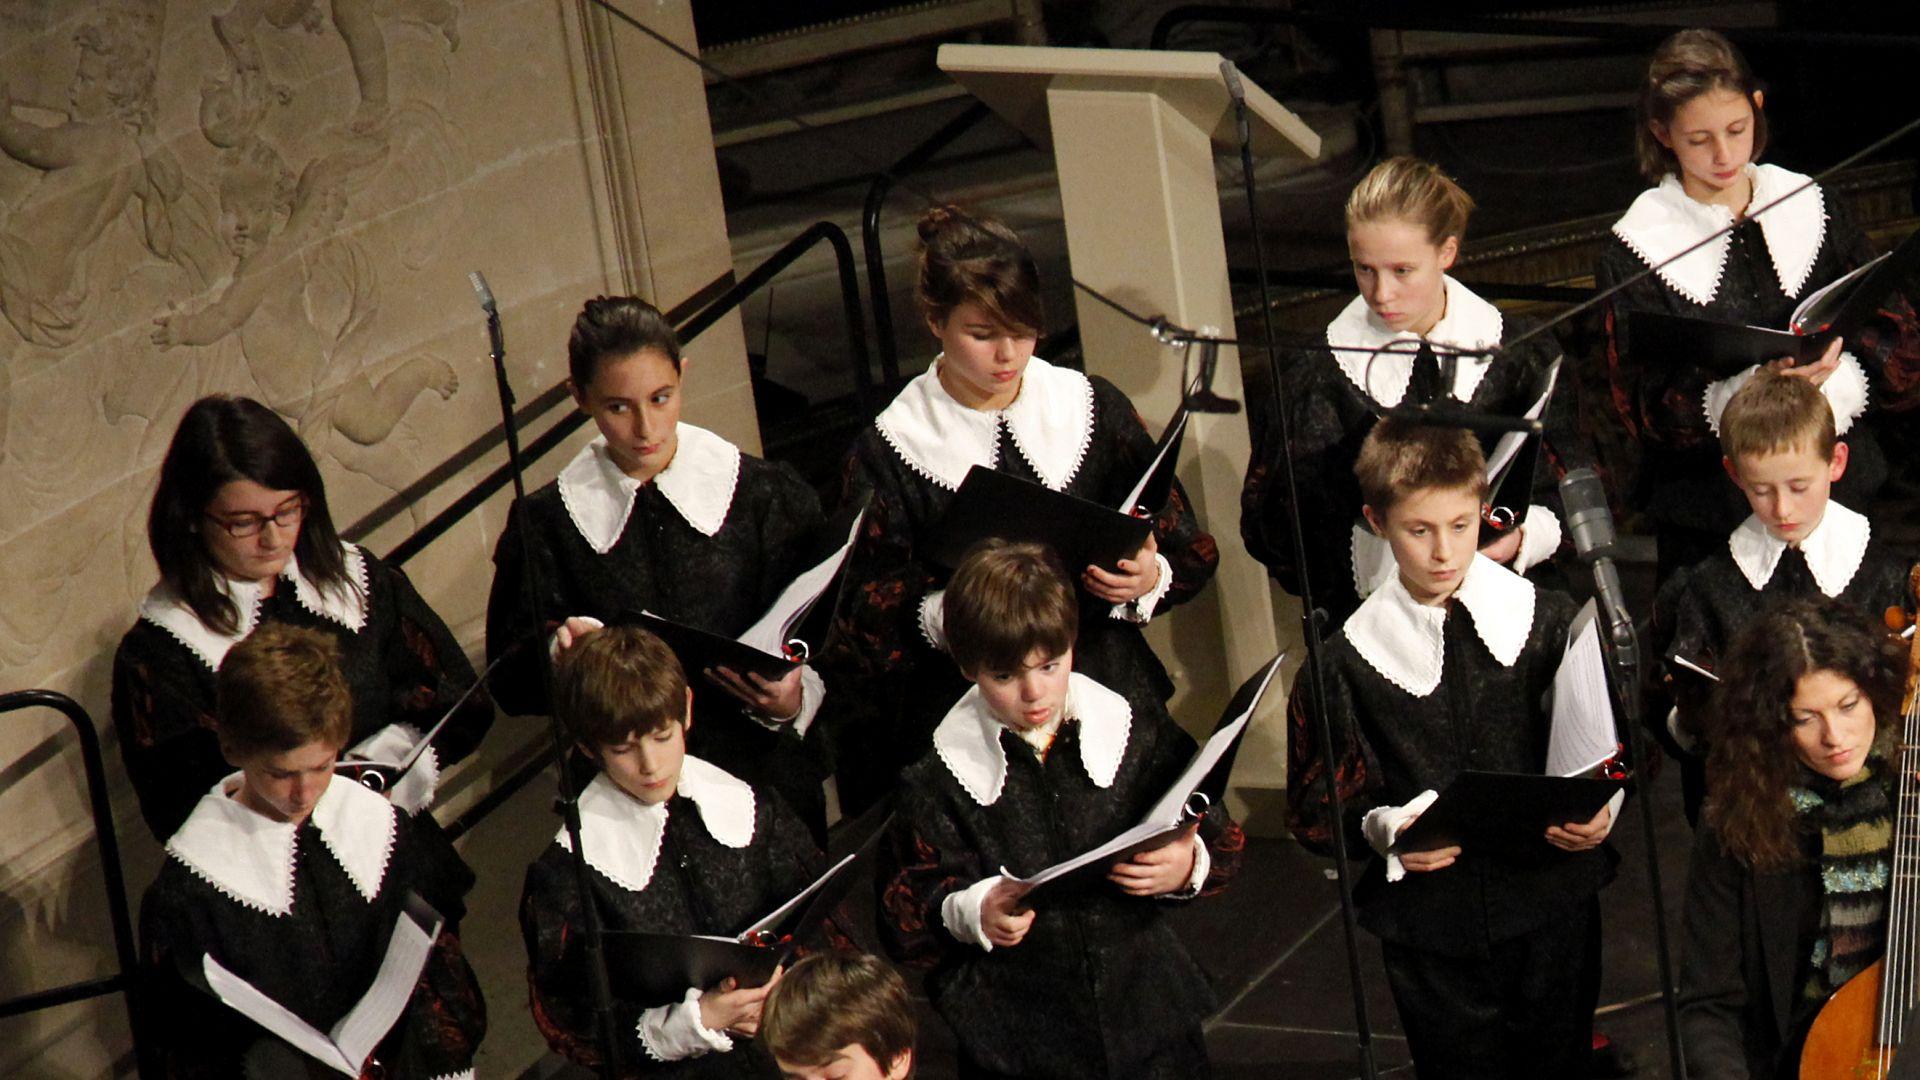 Messe de Noël de Michael Praetorius